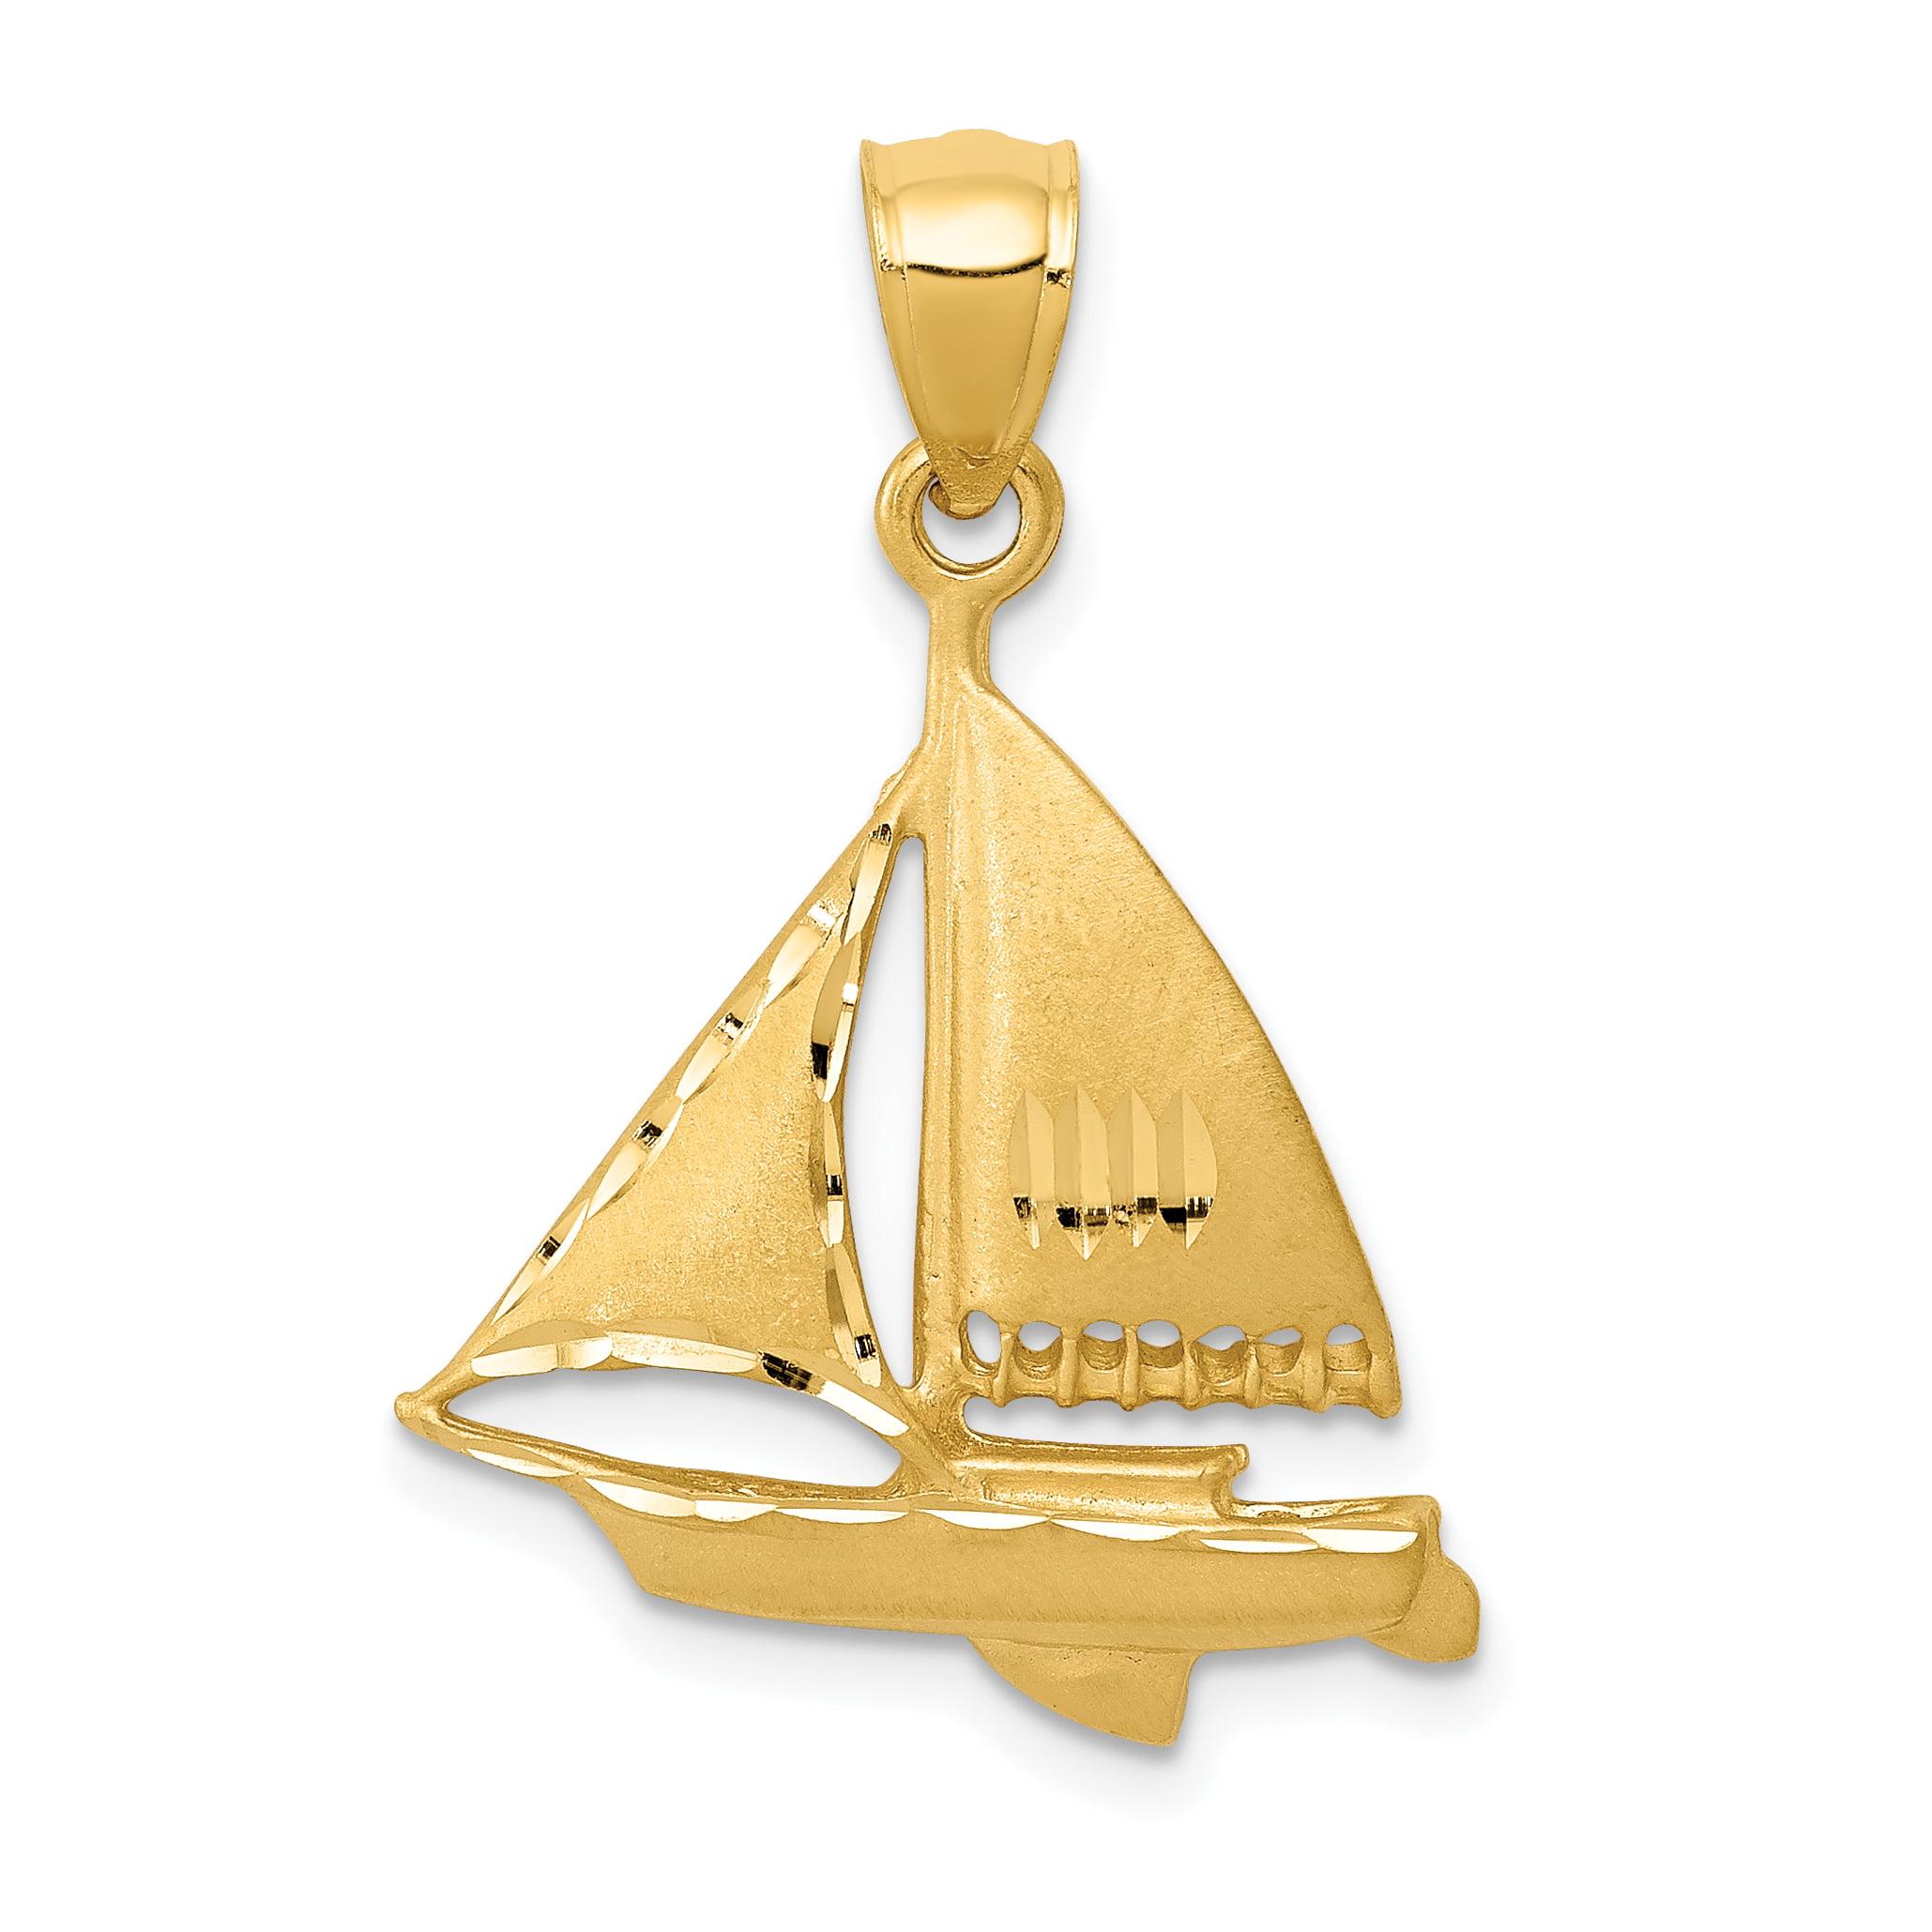 14k Yellow Gold Sailboat Pendant Charm